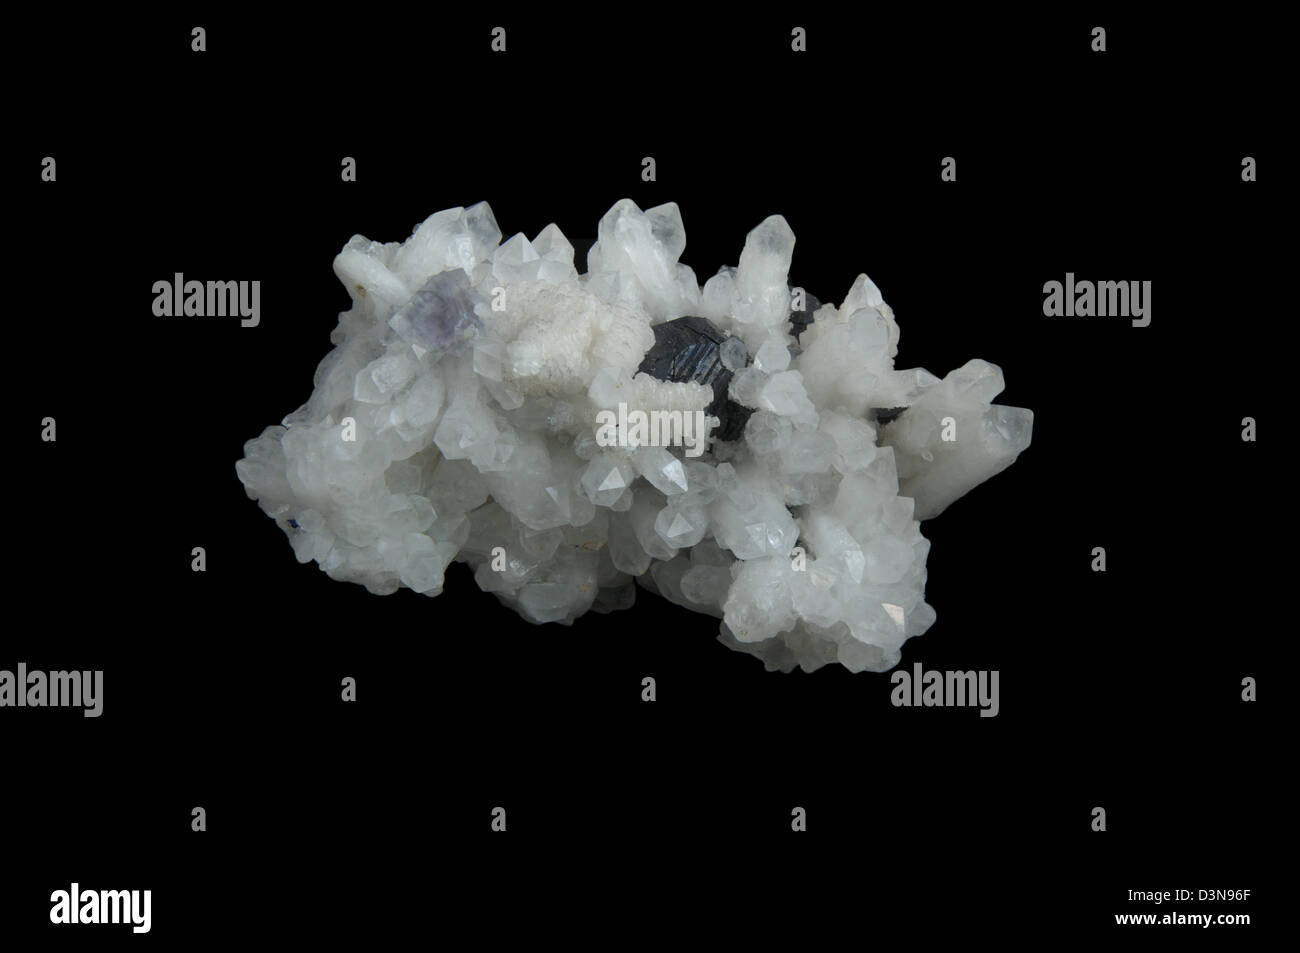 White quartz, sphalerite, calcite isolated on black background - Stock Image